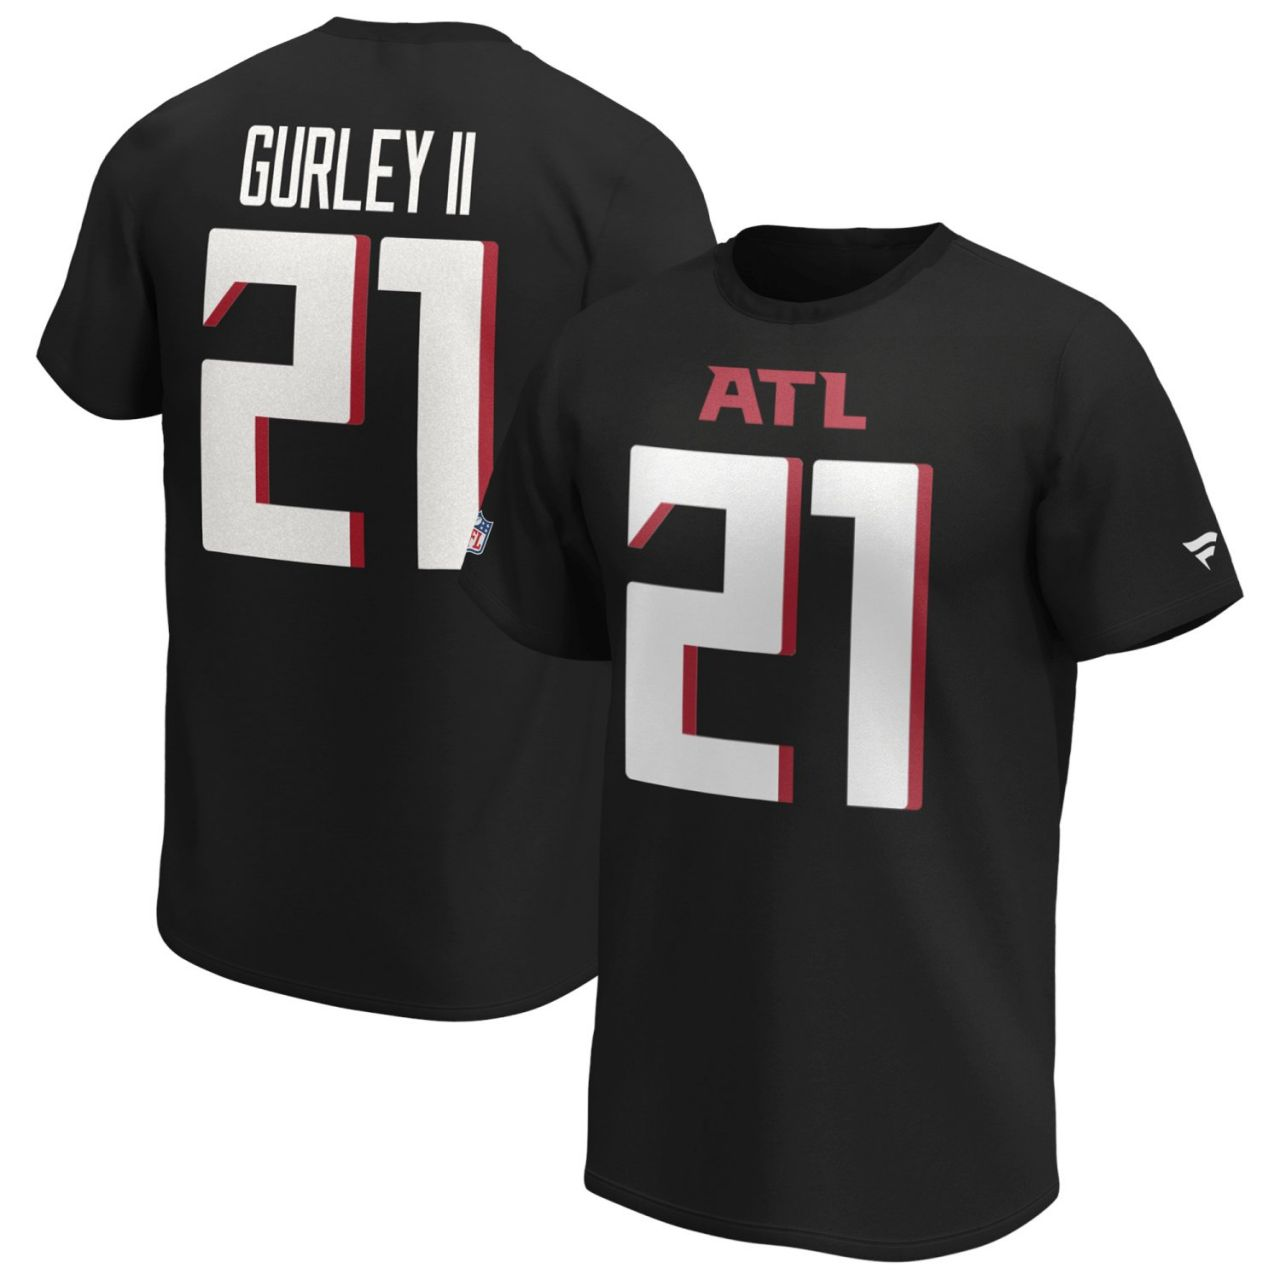 amfoo - Atlanta Falcons NFL Shirt #21 Todd Gurley